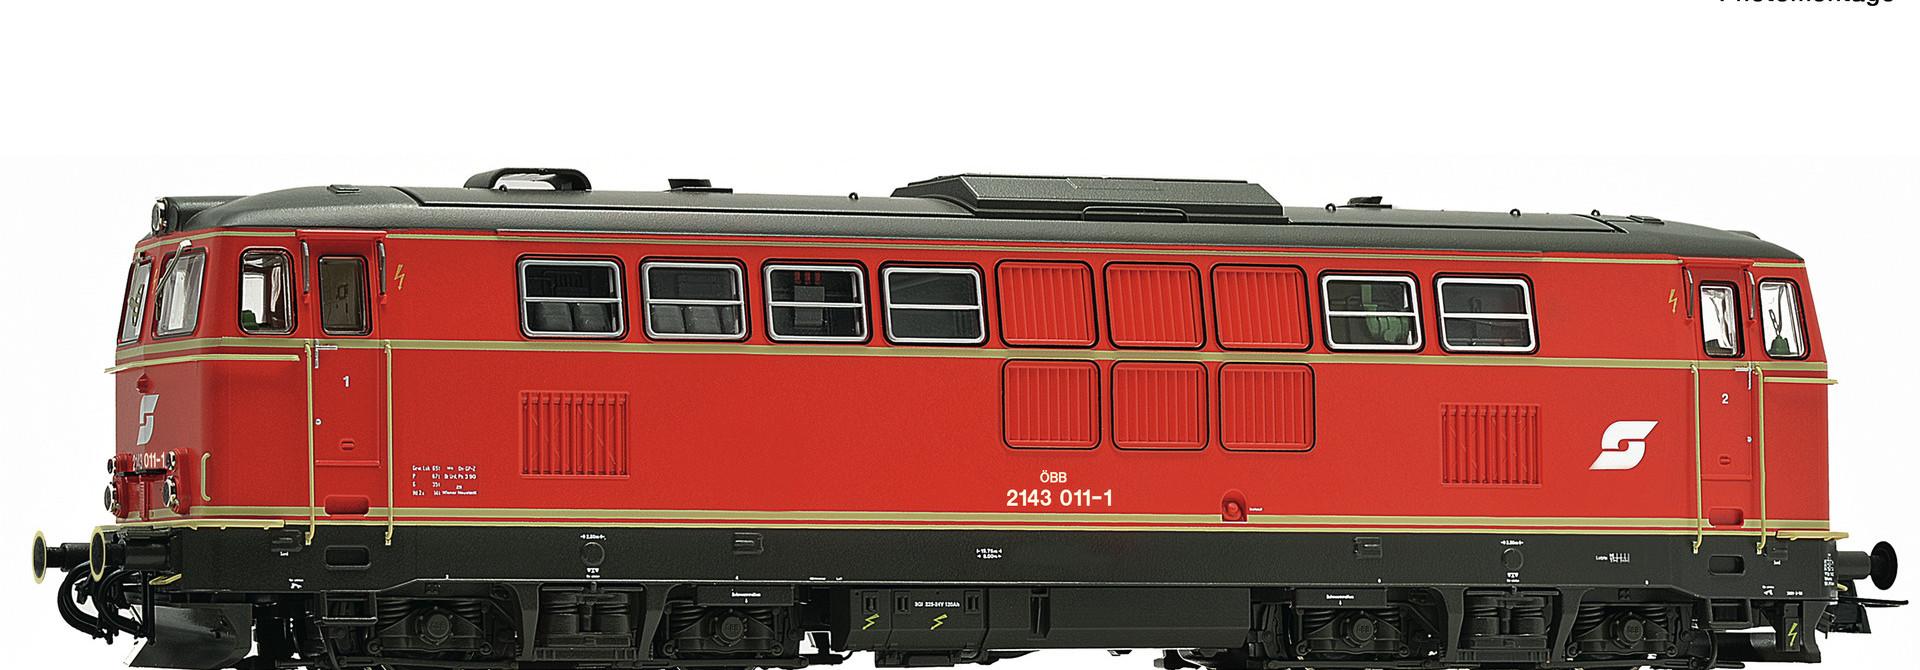 70713 Diesellok Rh 2143 ÖBB